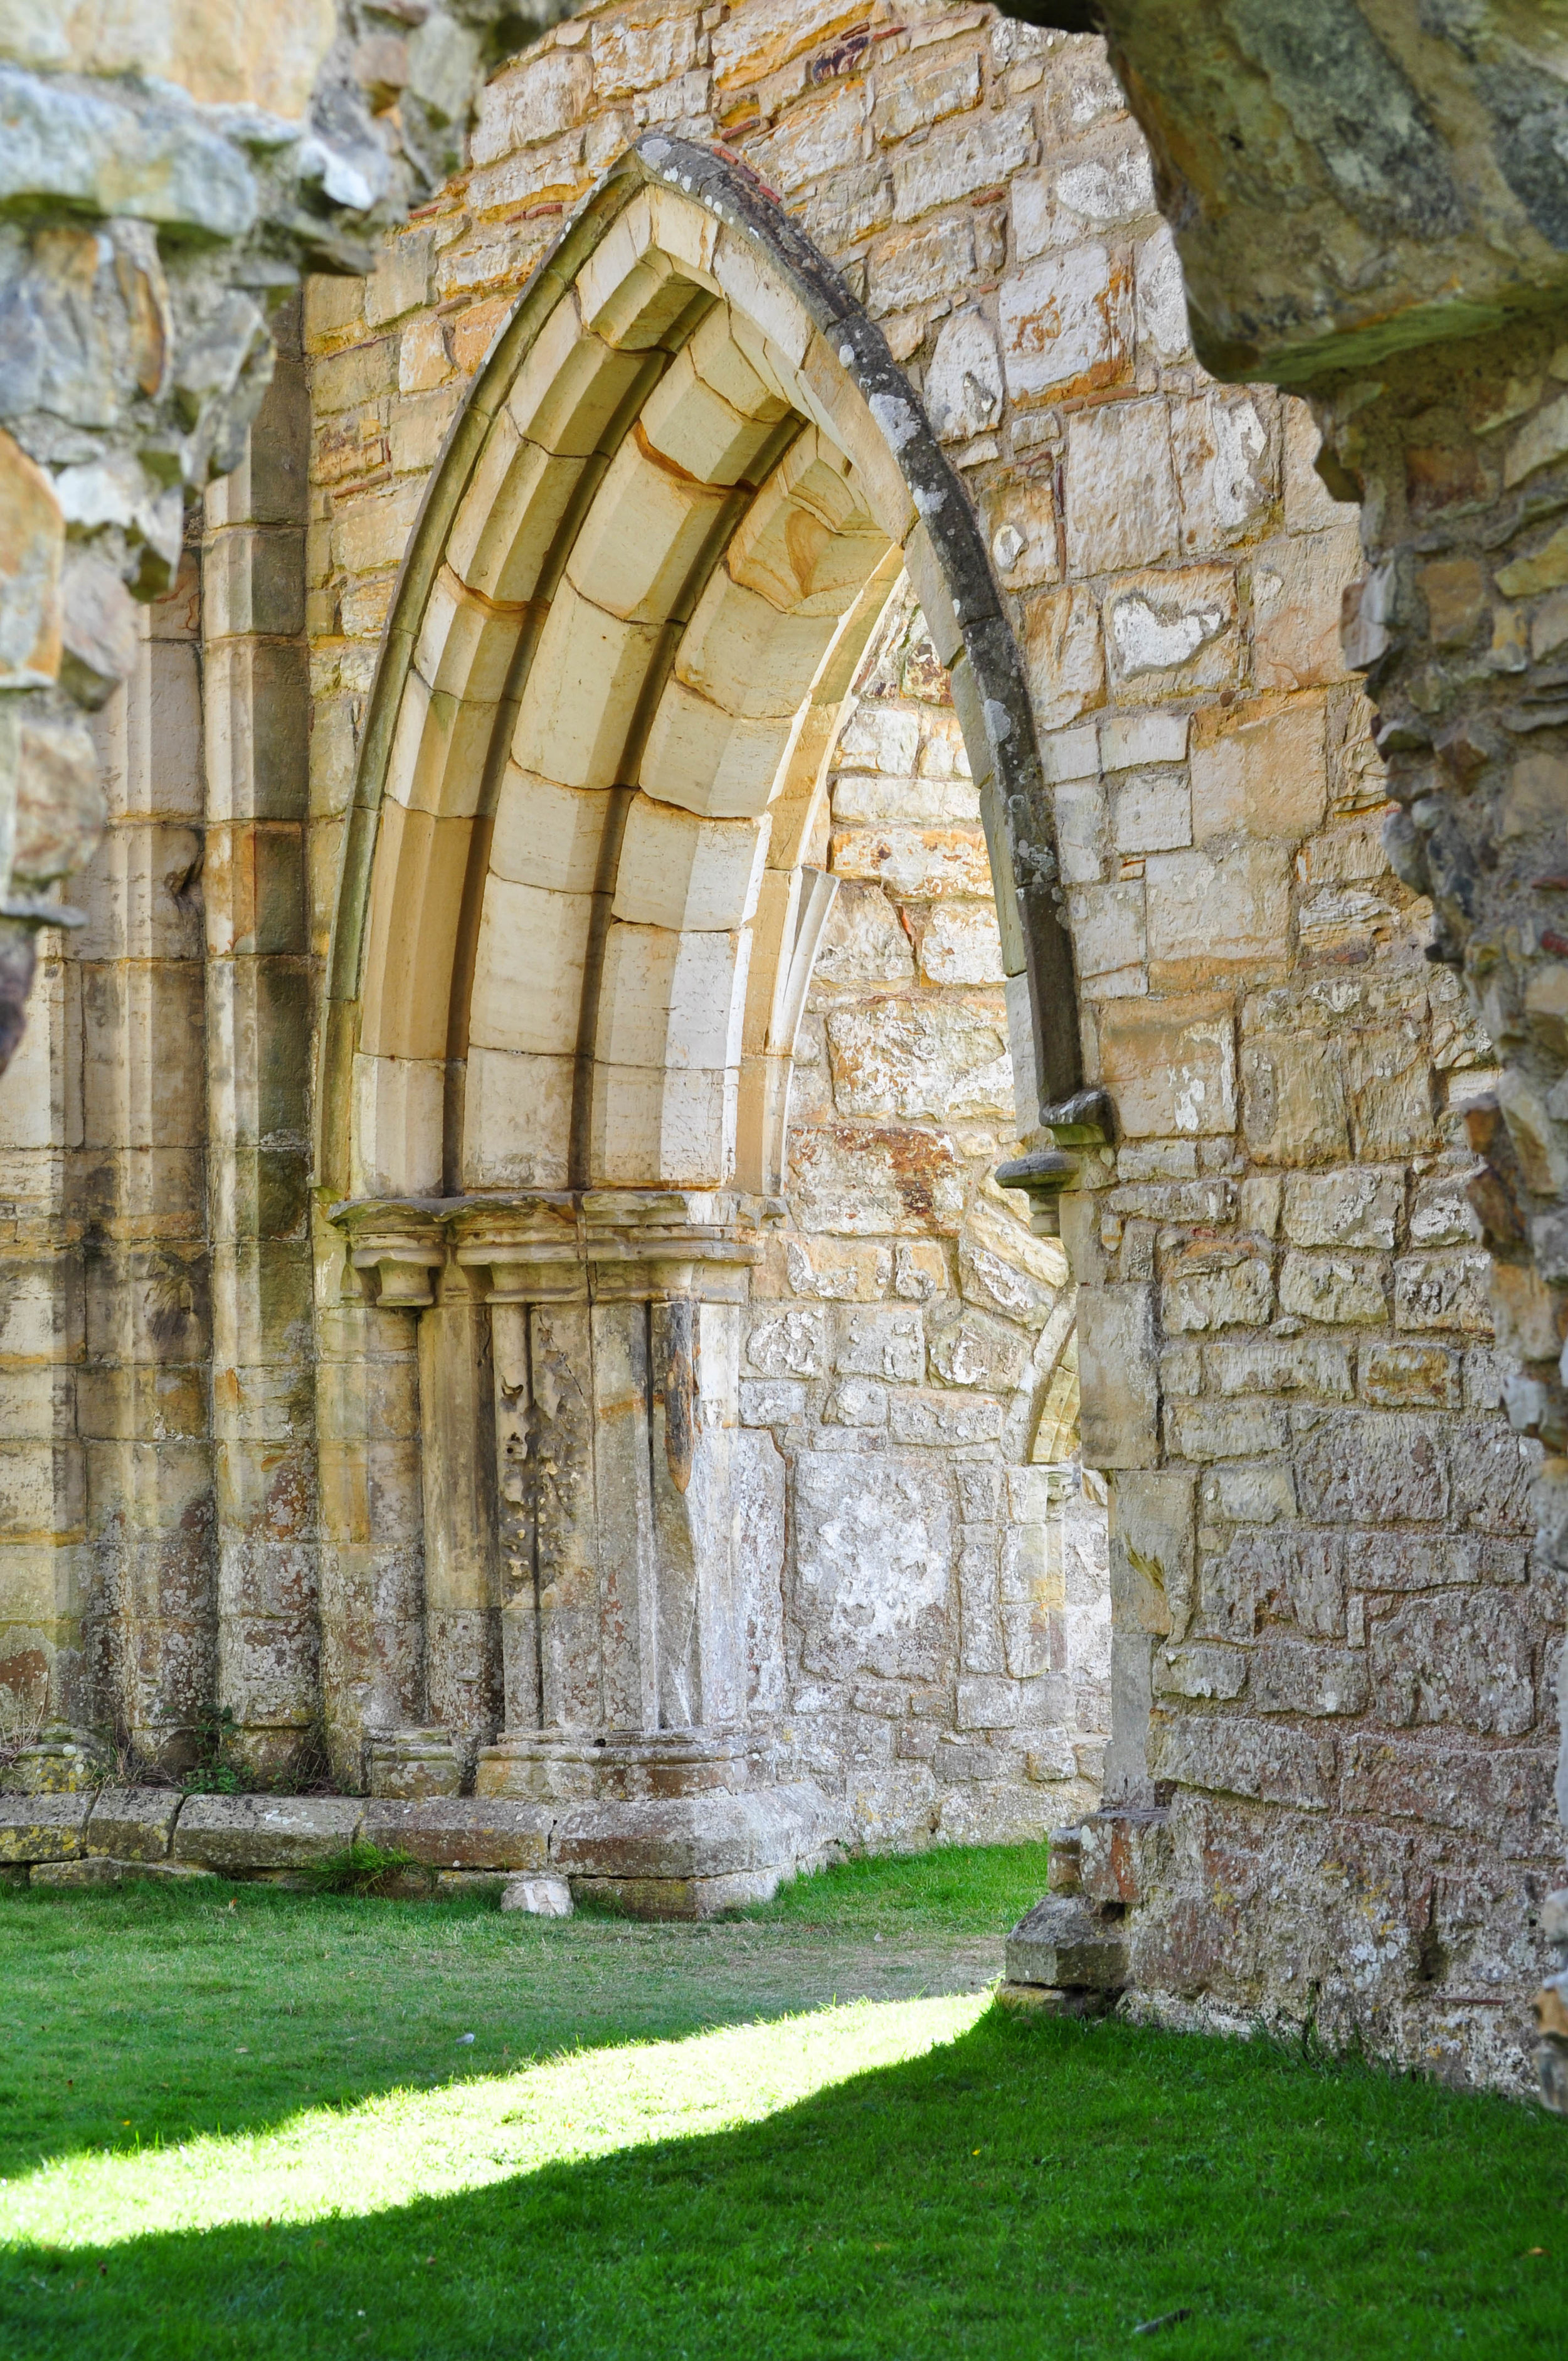 Abbey ruins, England 2011